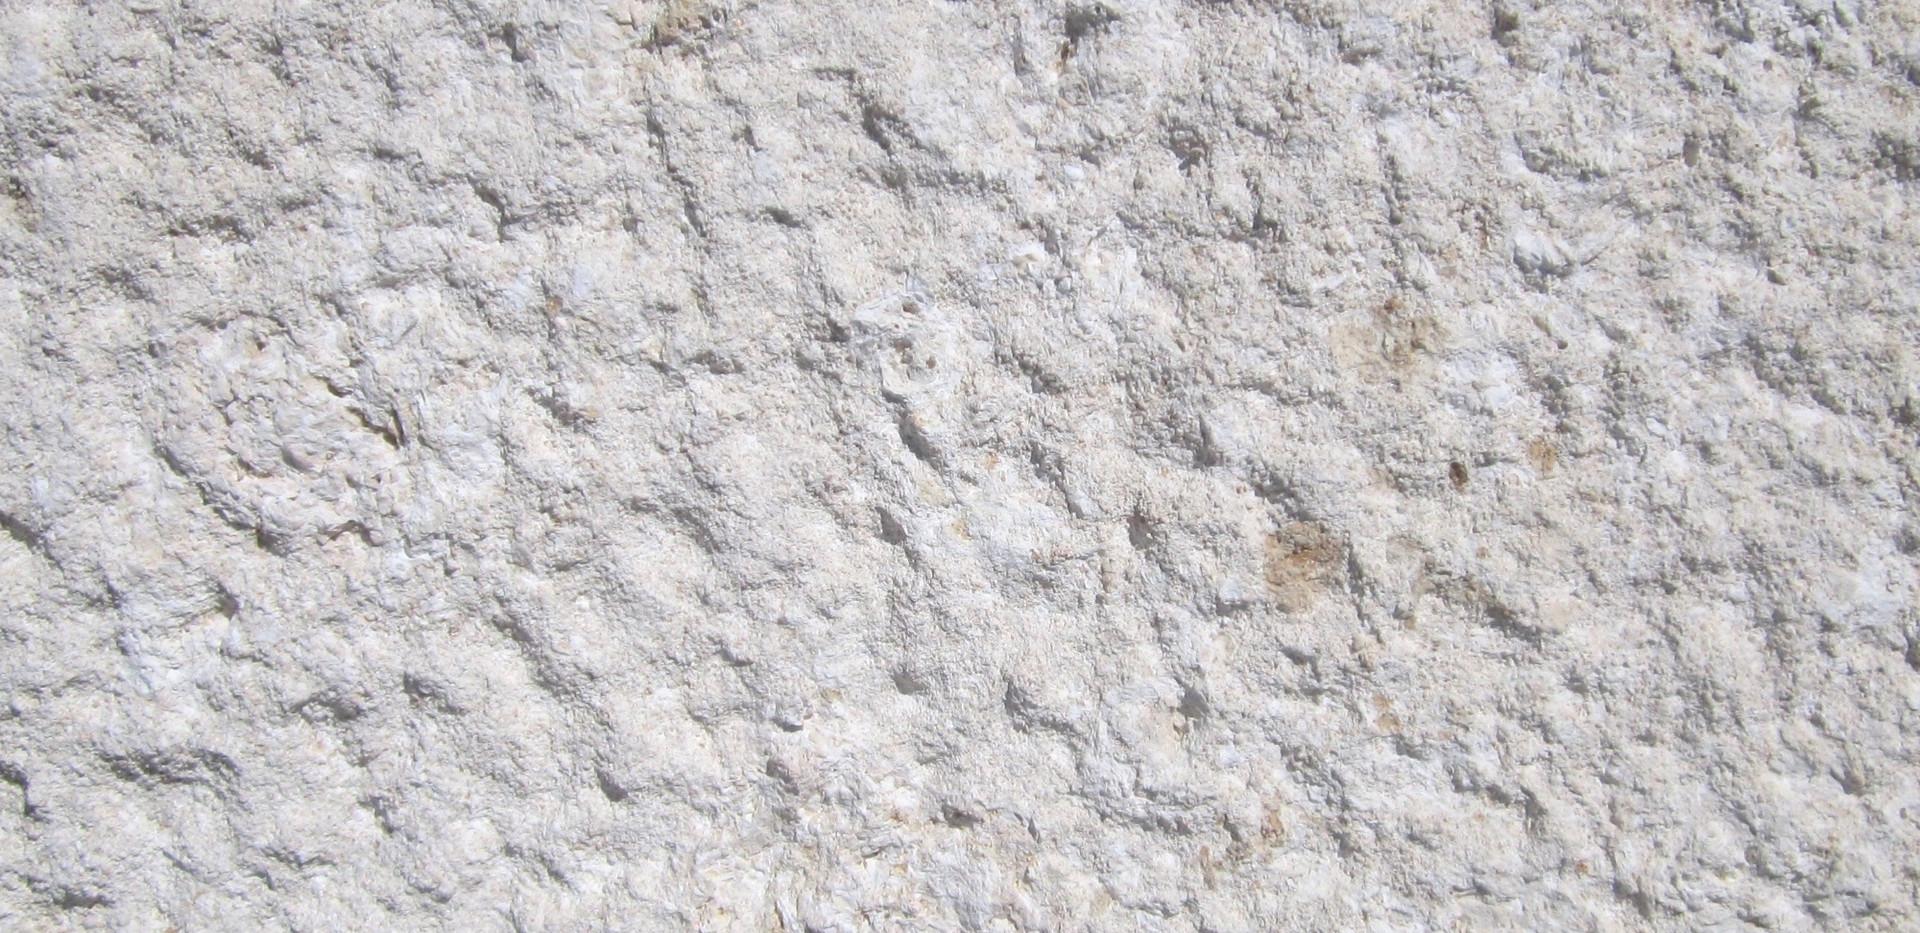 09-bianco-avorio-spuntato.jpg